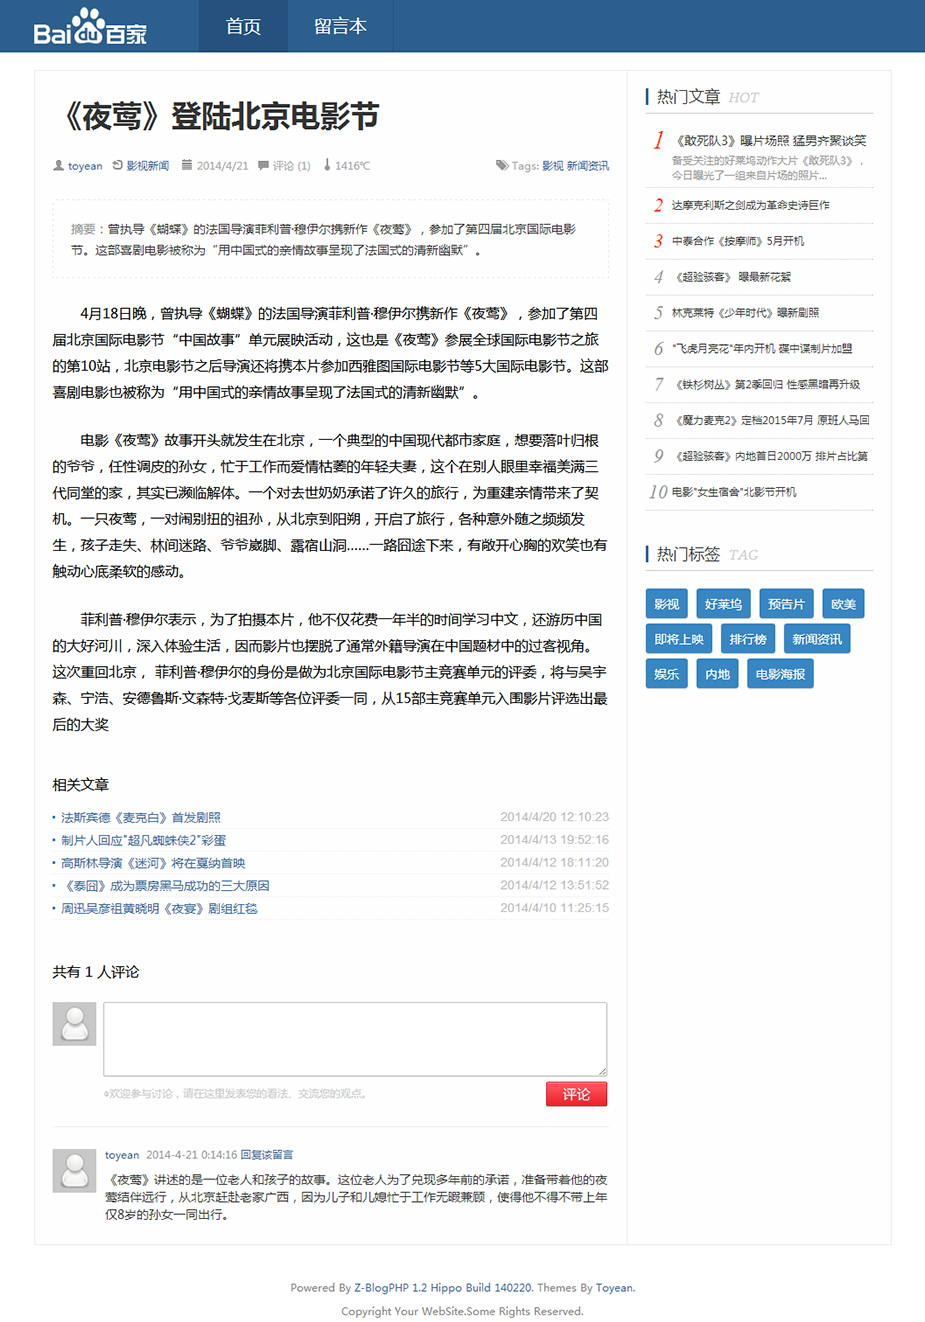 仿百度百家zblog php&asp cms模板主题拓源百家baijia